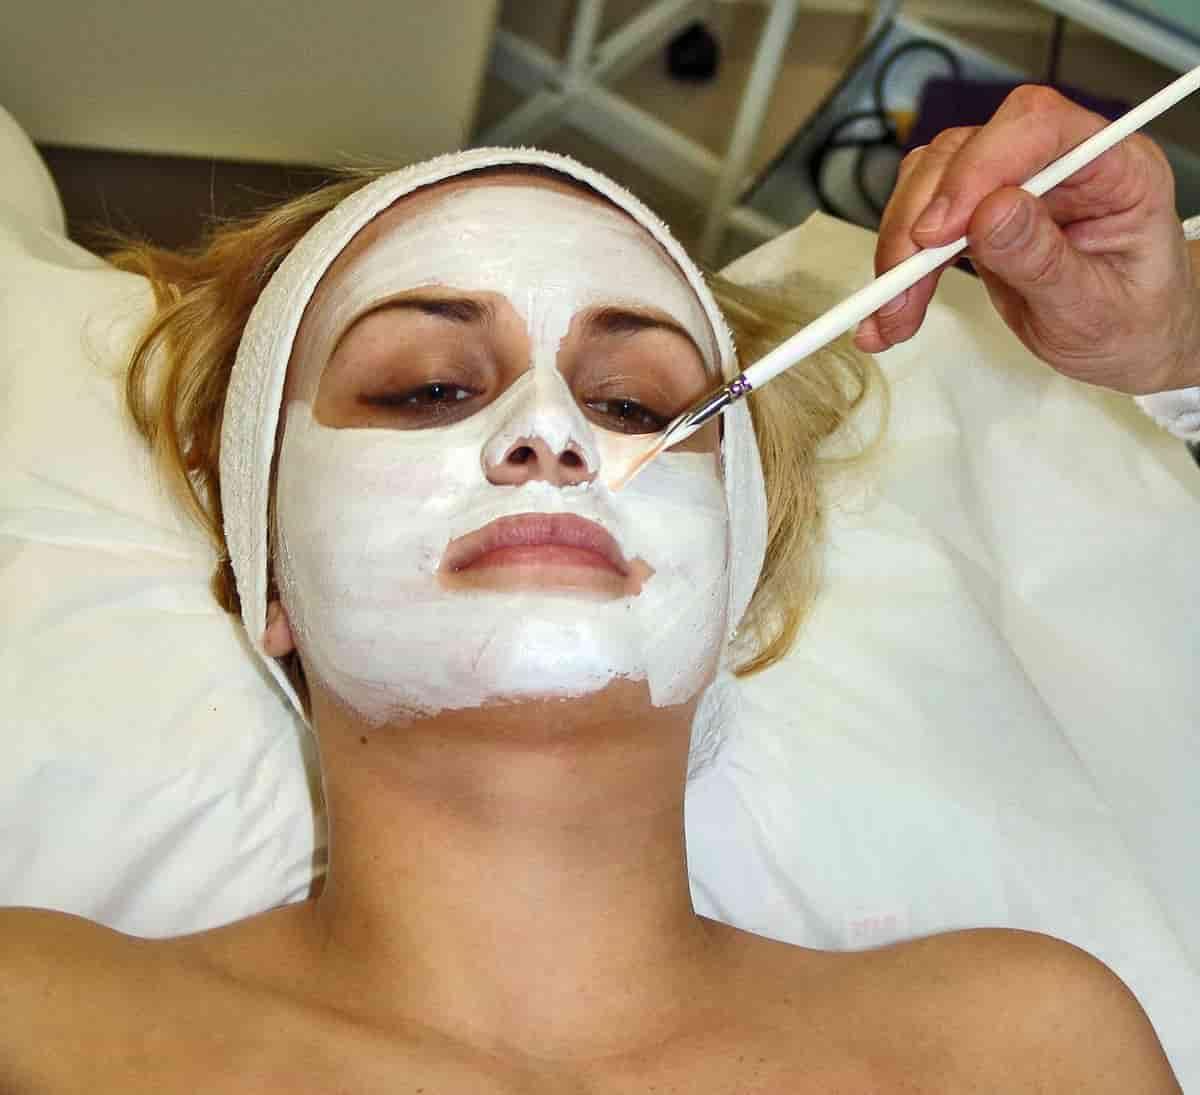 Face Bleach Get Insta Glow Skin At Home